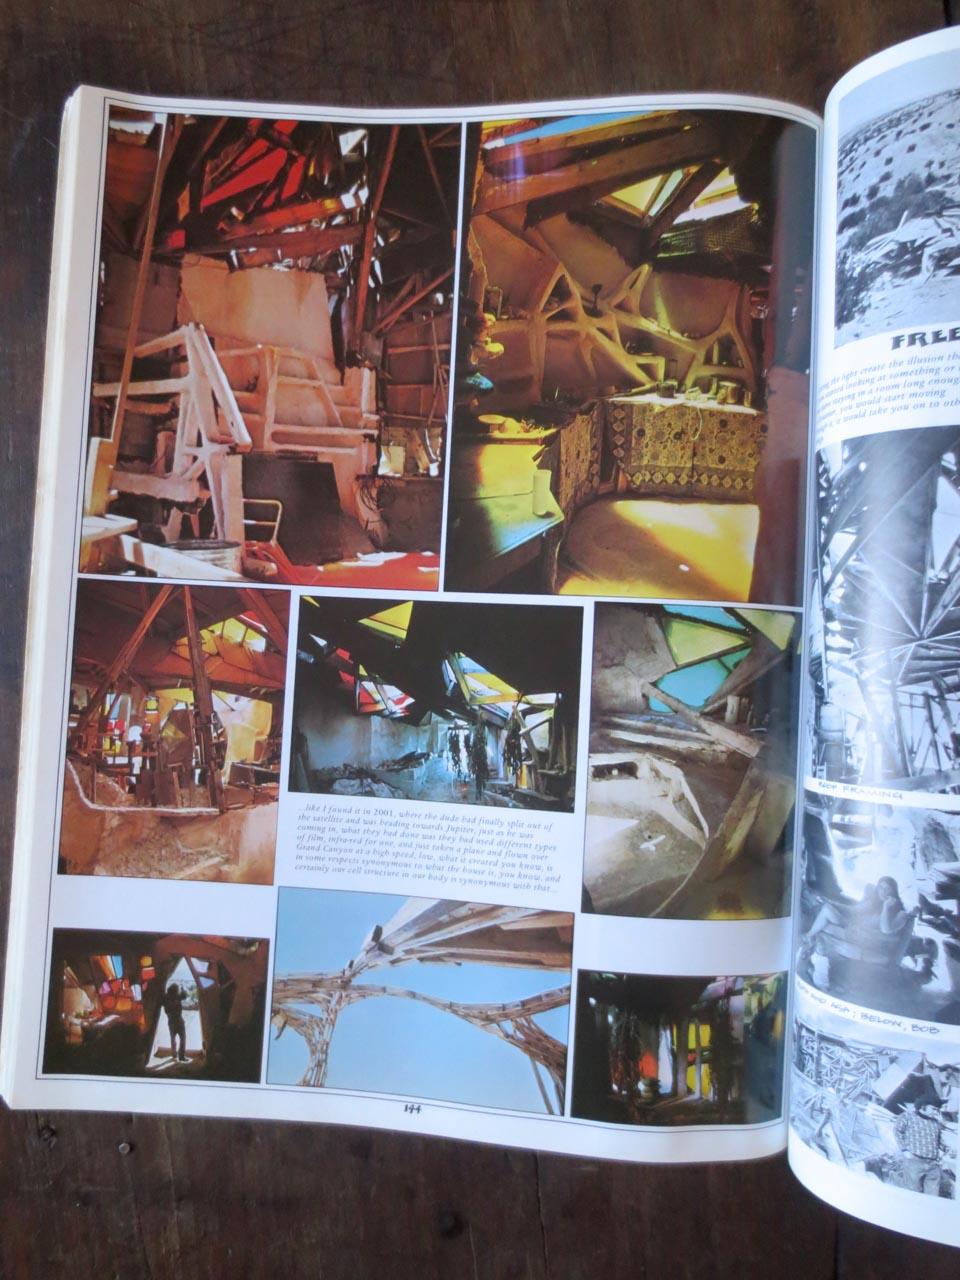 RW_House book-3097.jpg